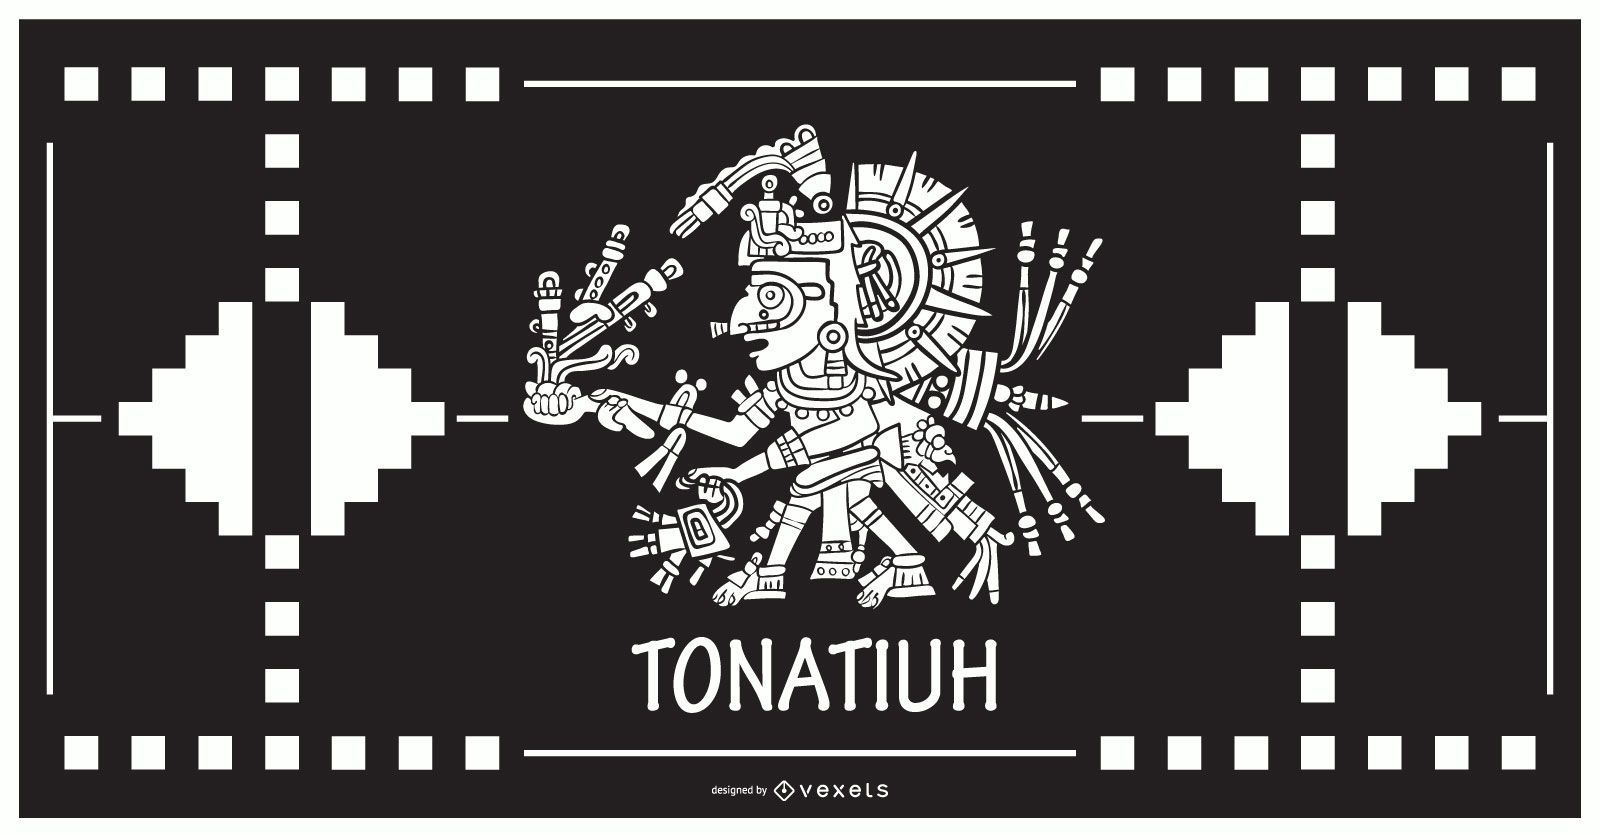 Diseño de dios azteca tonatiuh